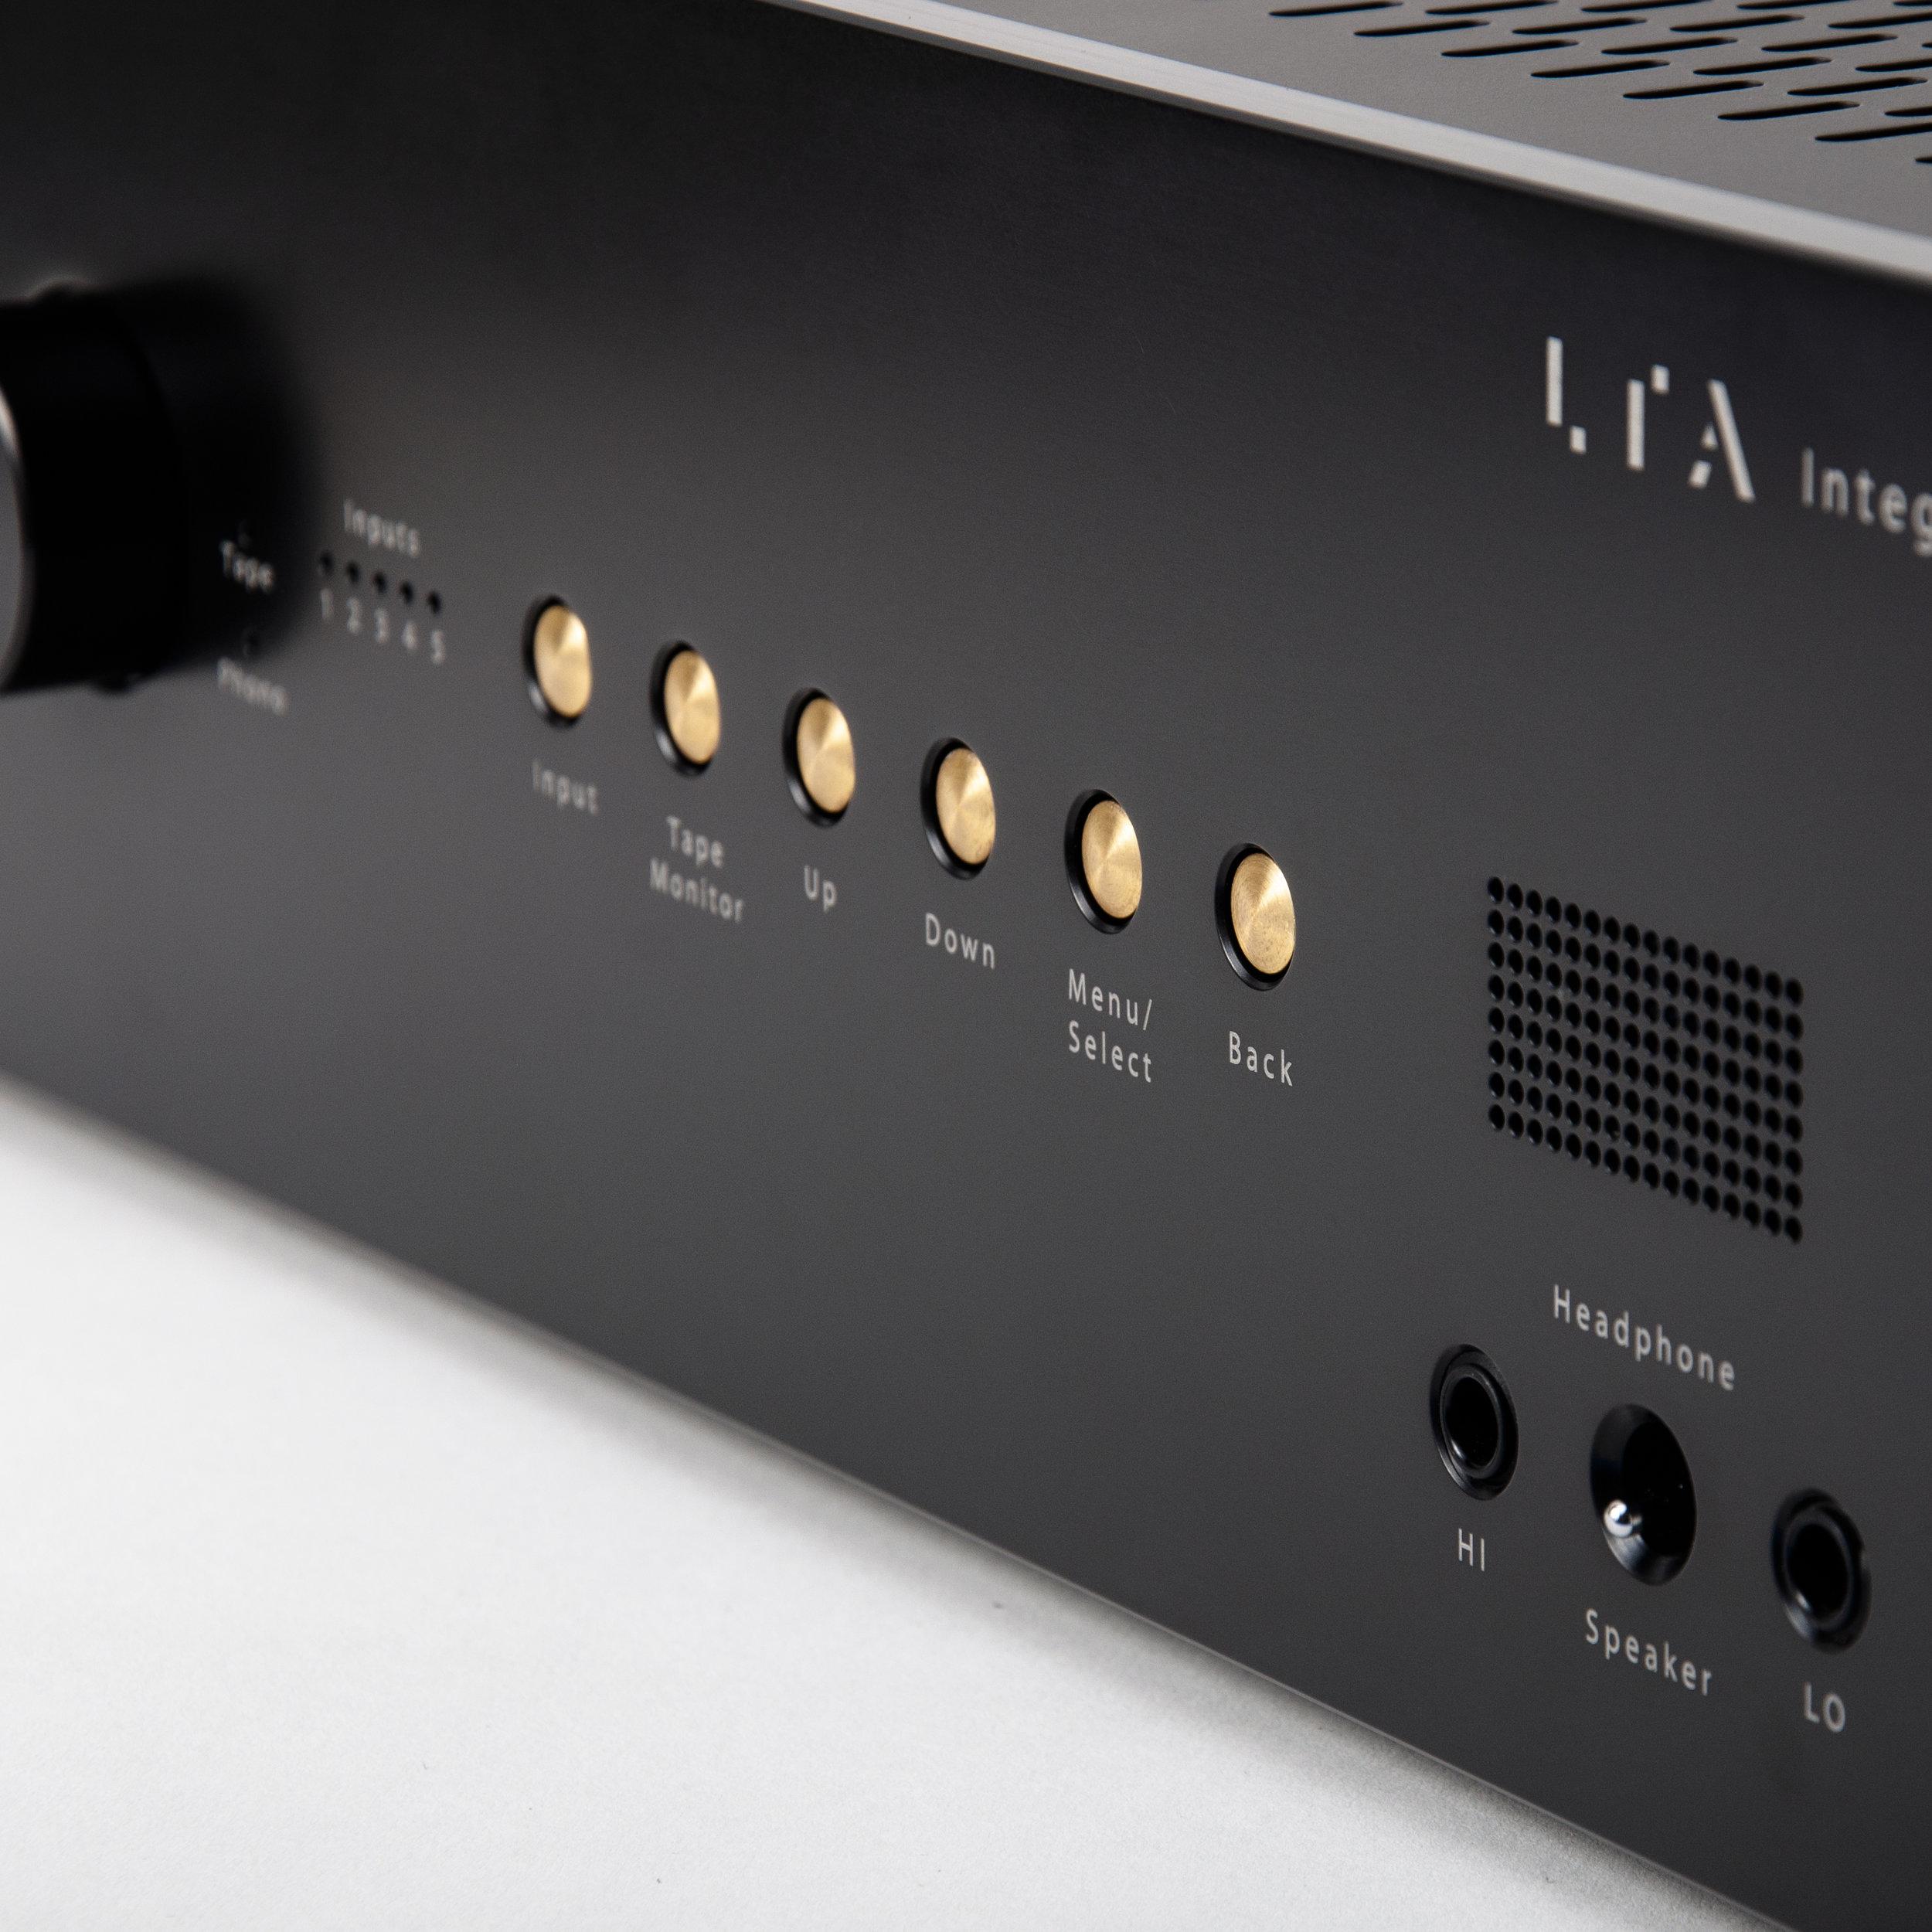 LTA Integrated Amp Detail1 Square.jpg